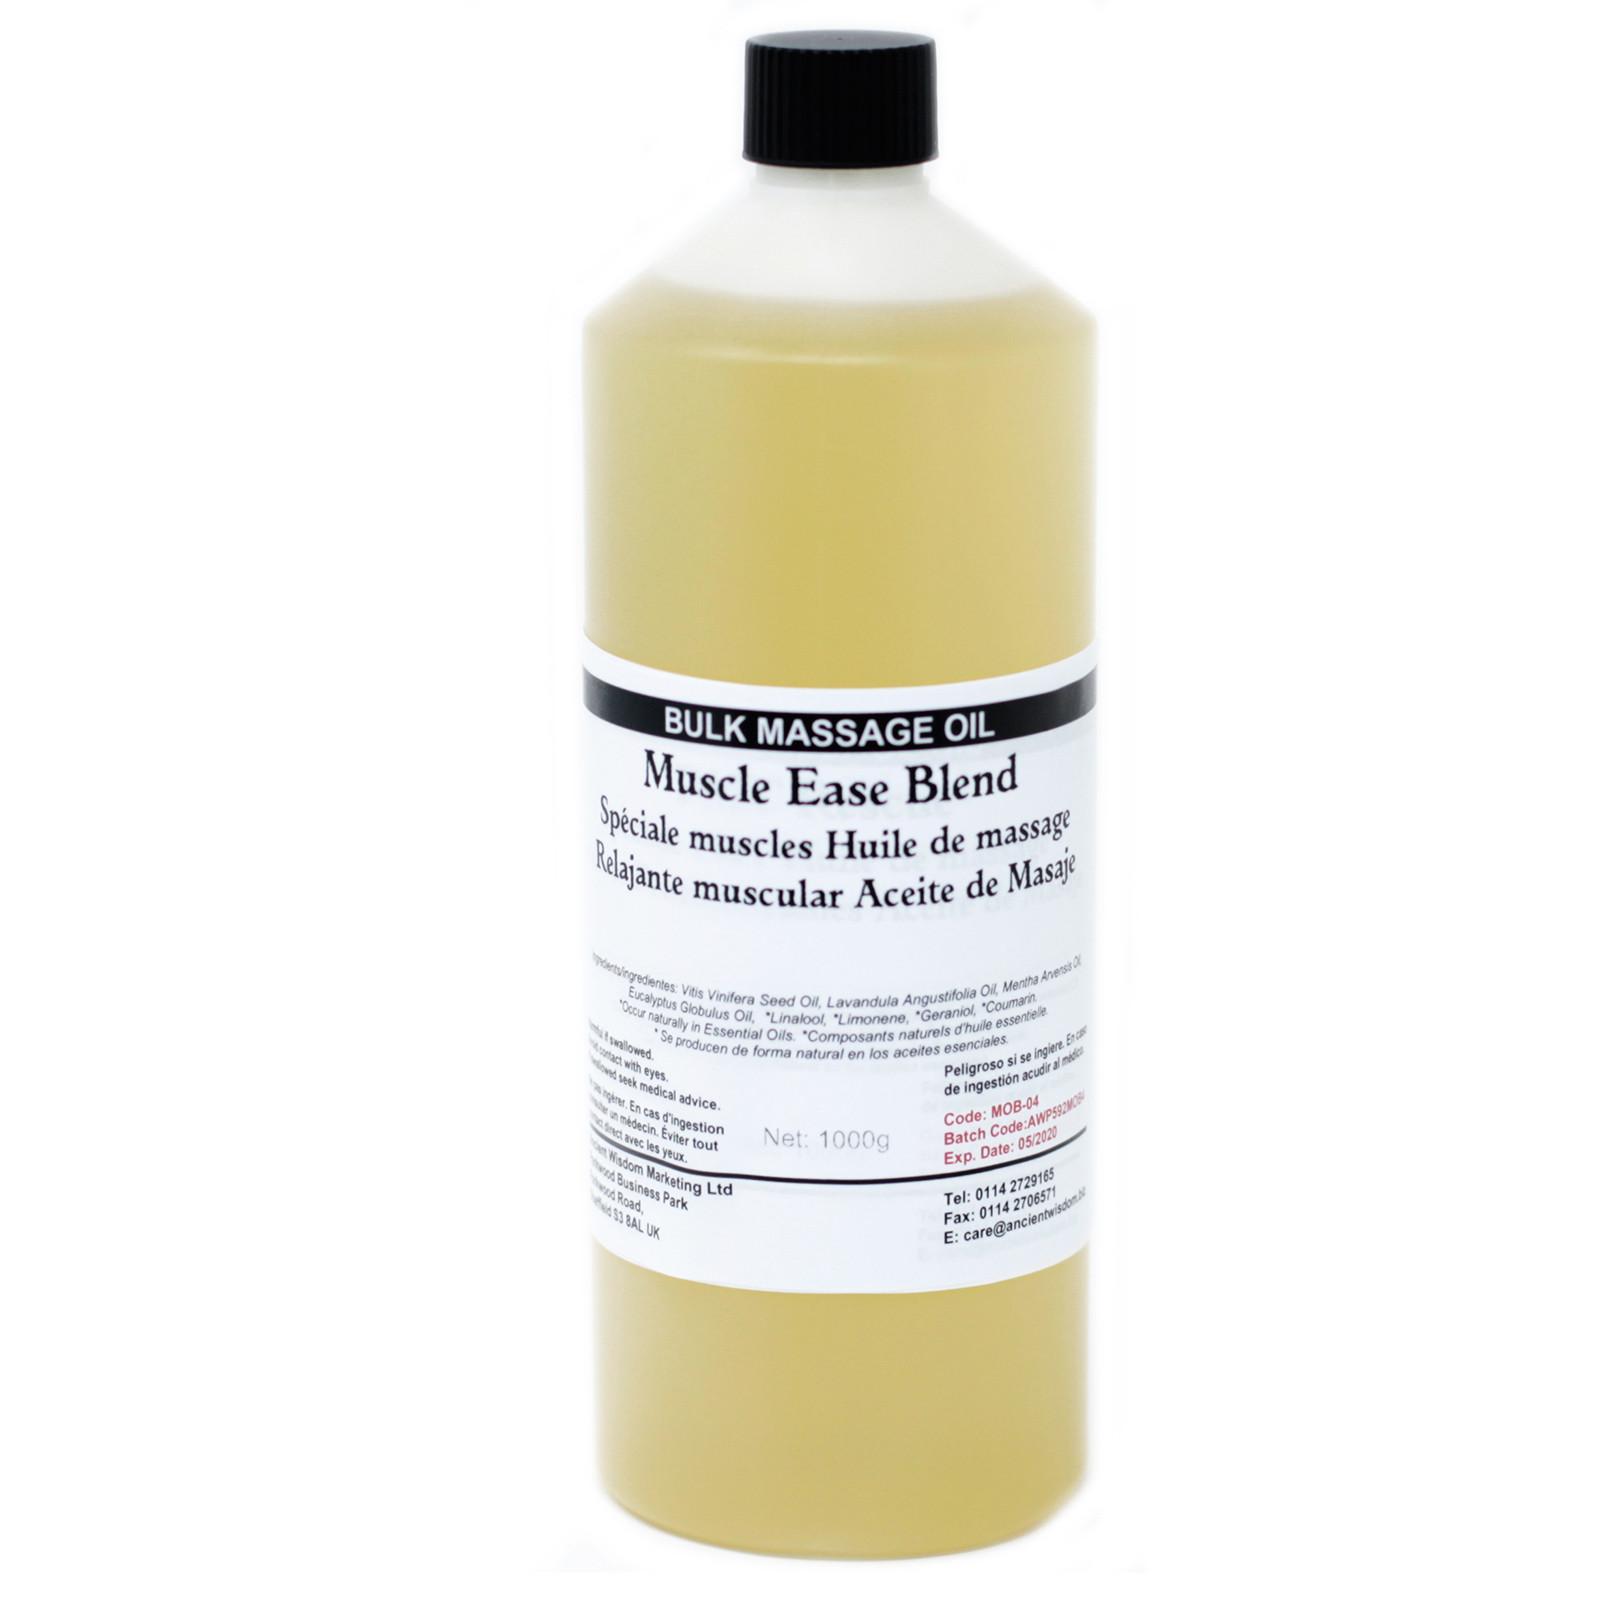 Muscle Ease 1Kg Massage Oil